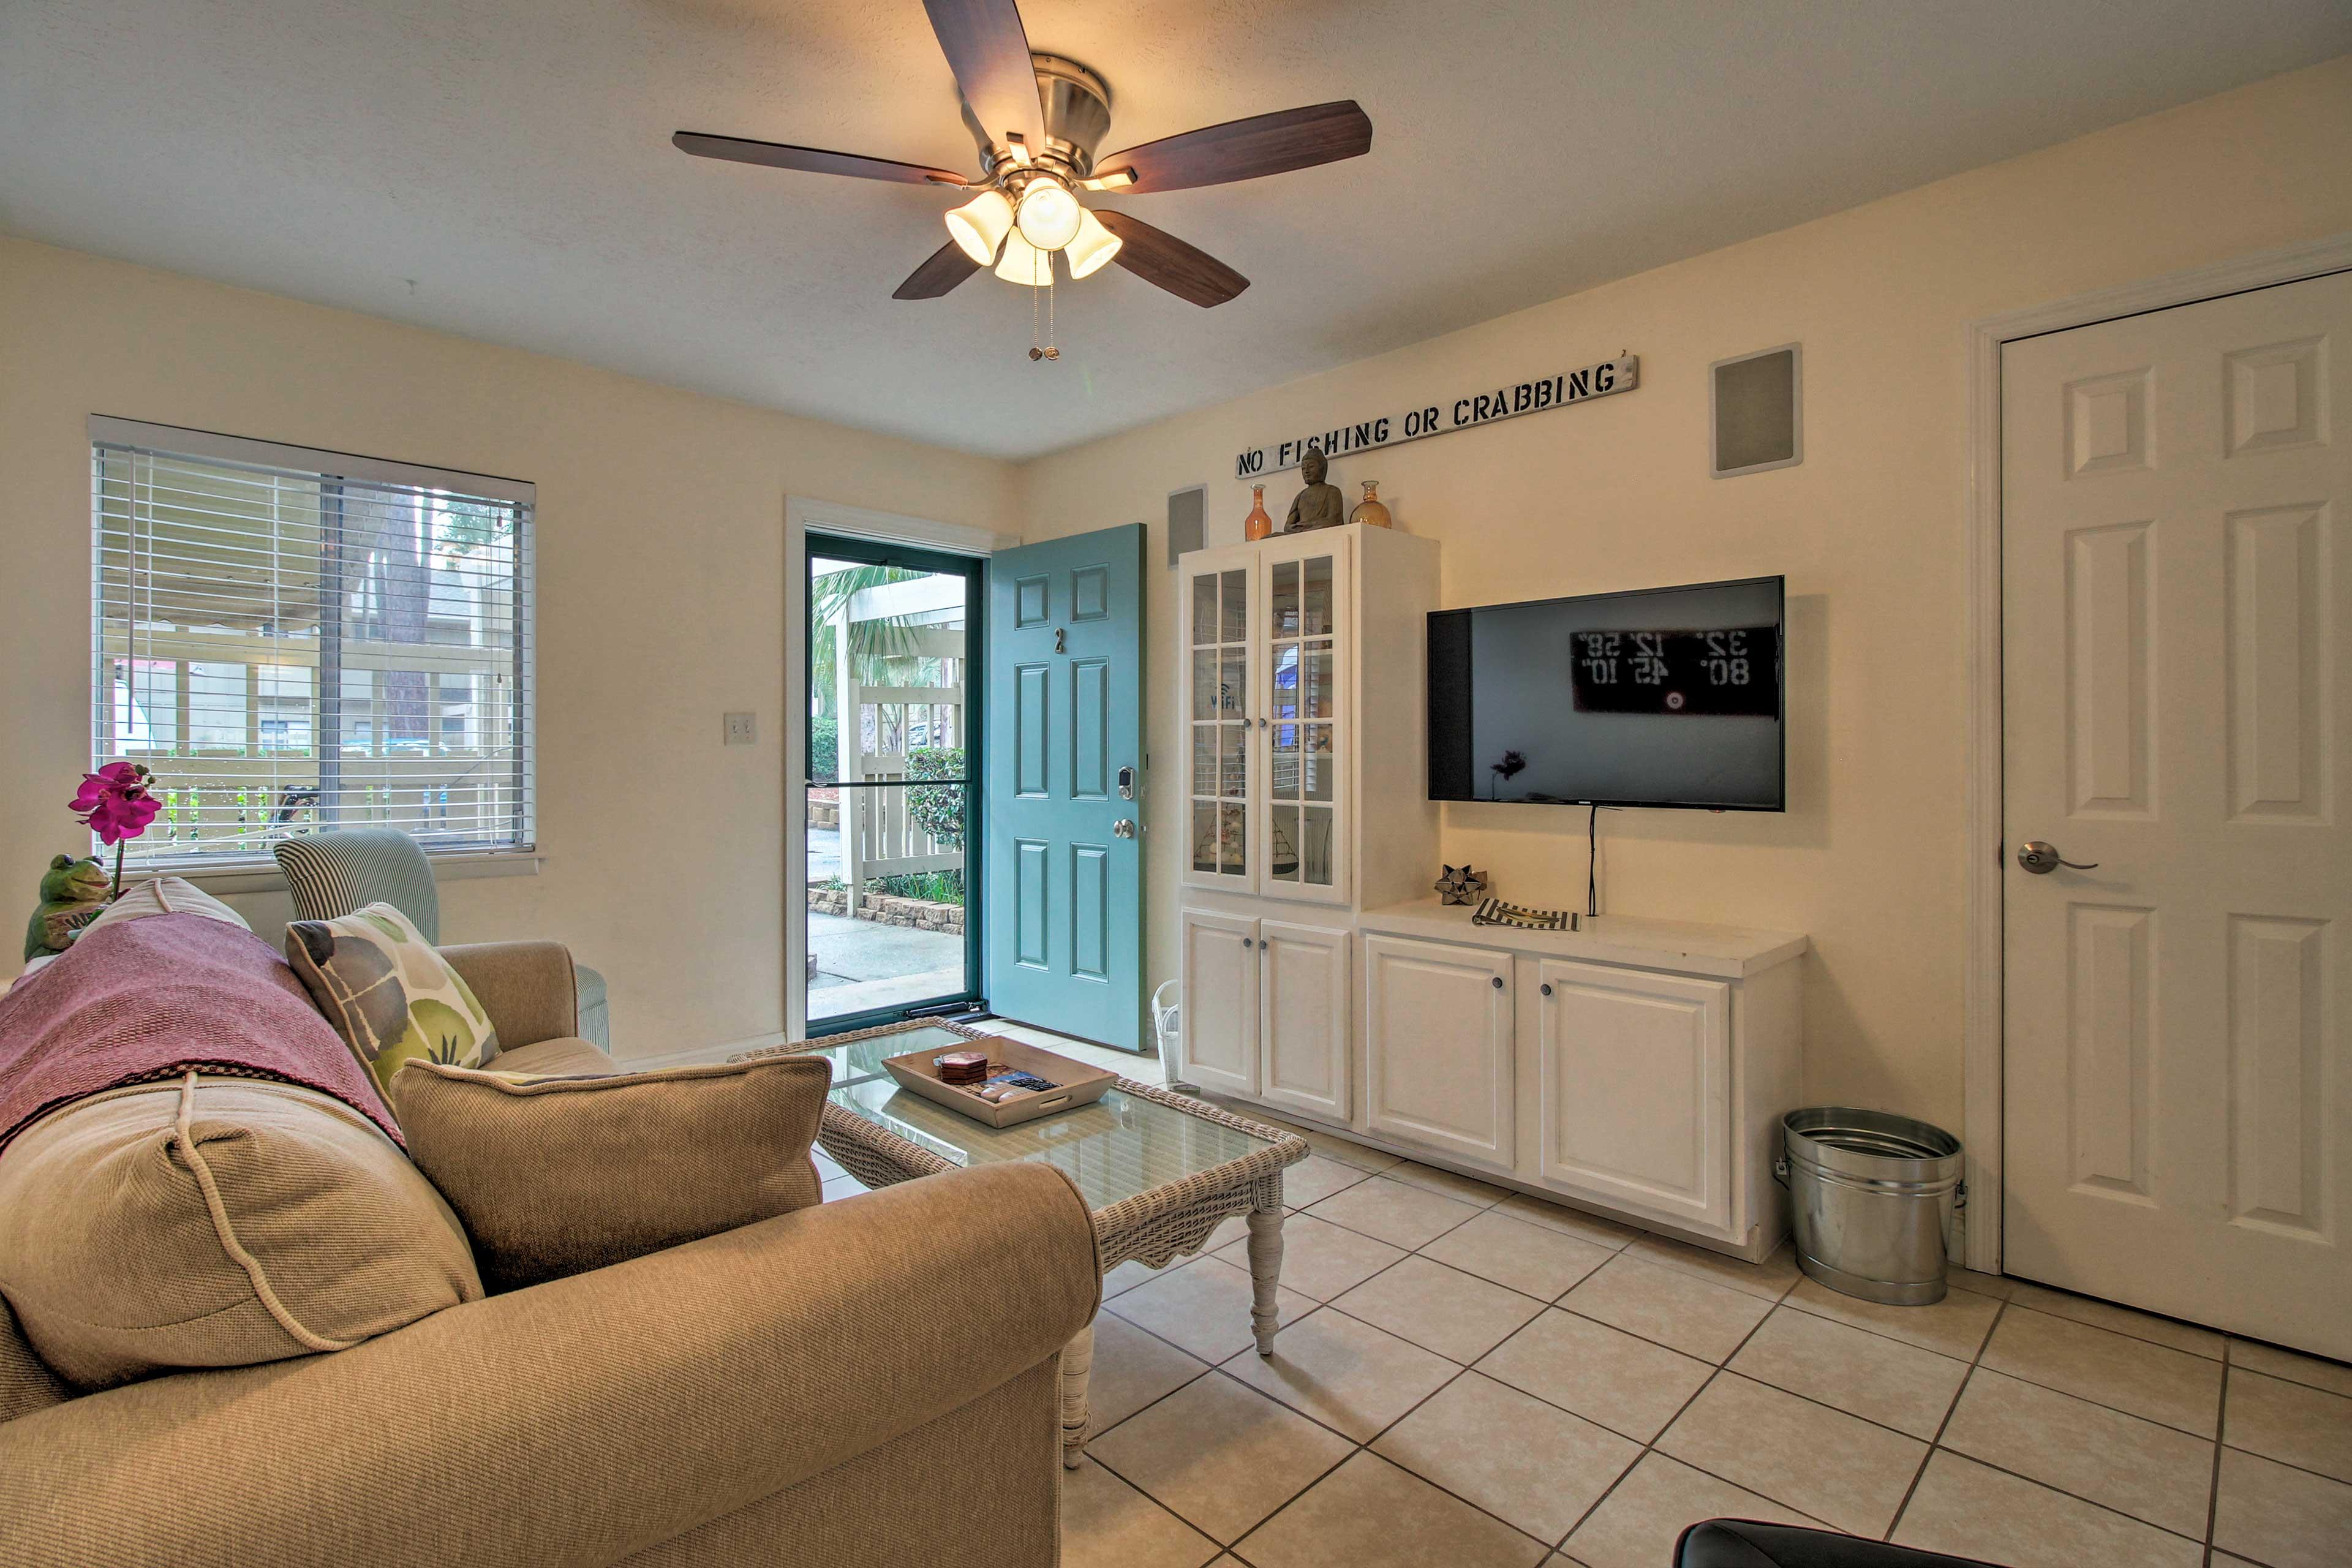 Hilton Head Vacation Rental Villa   2BR   1BA   1 Story   900 Sq Ft